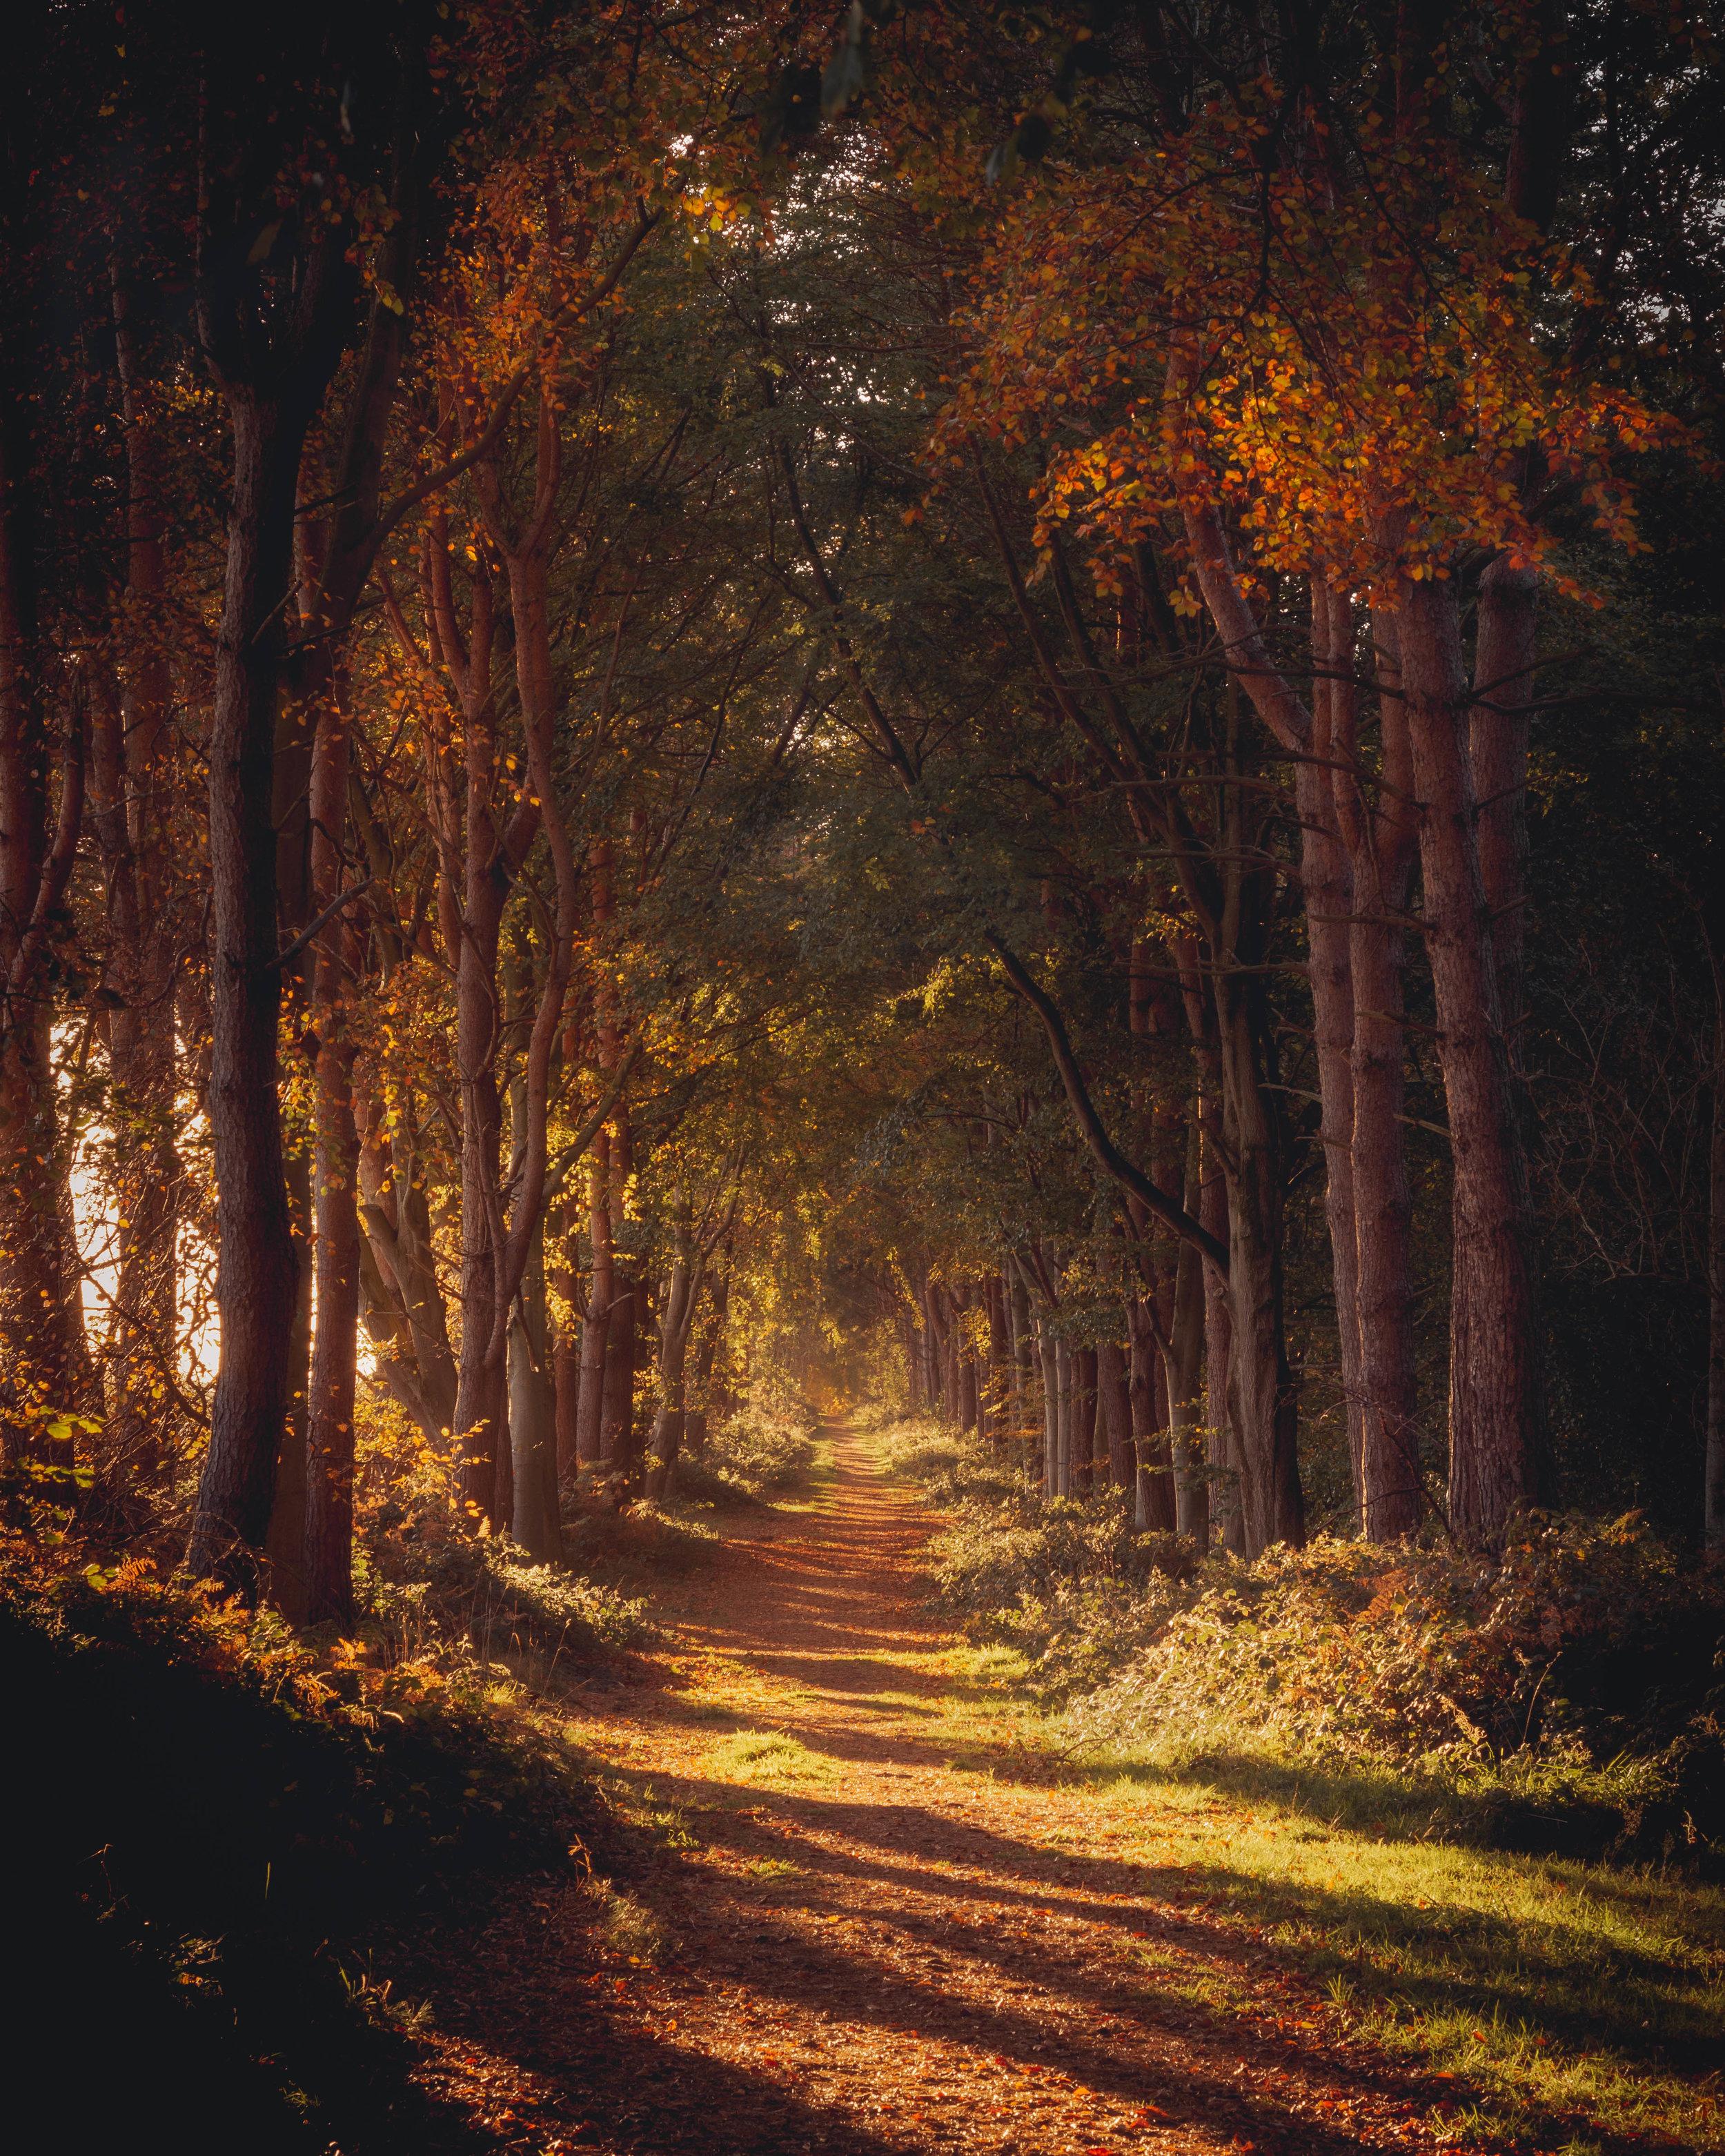 Autumn Evening in Binning Wood